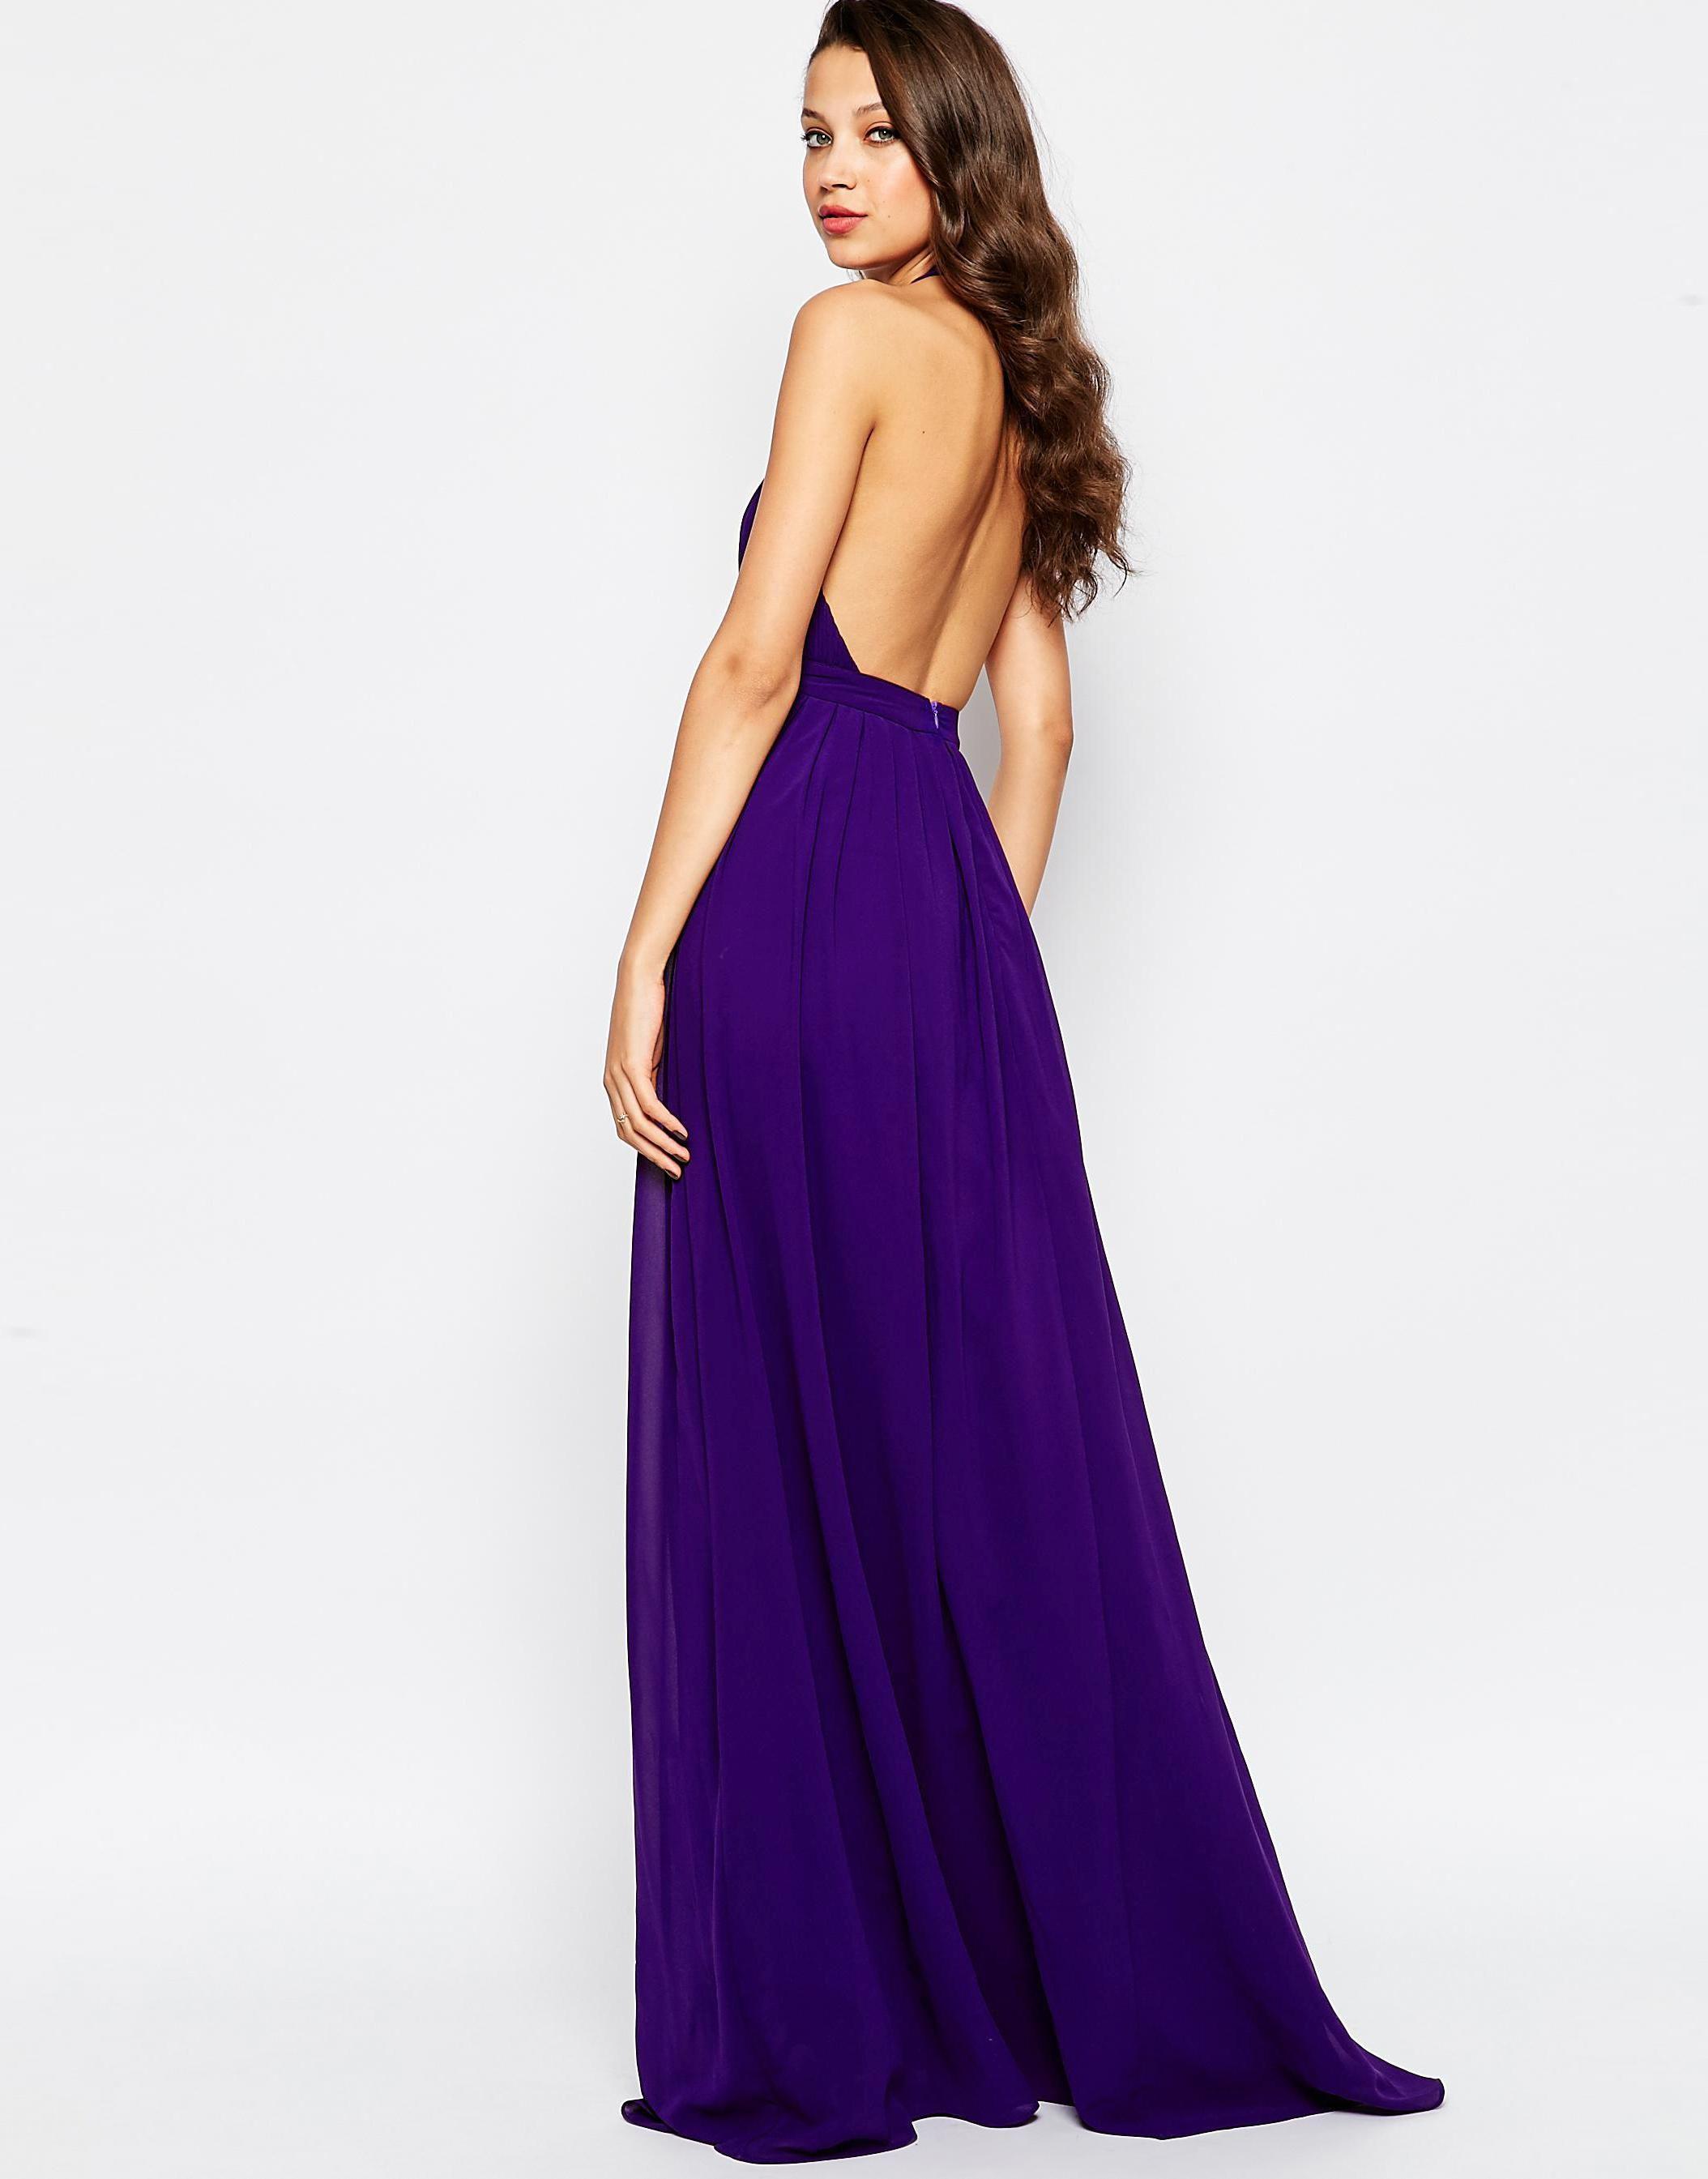 Www Asos Com True Decadence Tall Plunge Keyhole Maxi Dress Candice Blackburn Product Page Https Us Maxi Dress Dresses Backless Dress Formal [ 2689 x 2108 Pixel ]